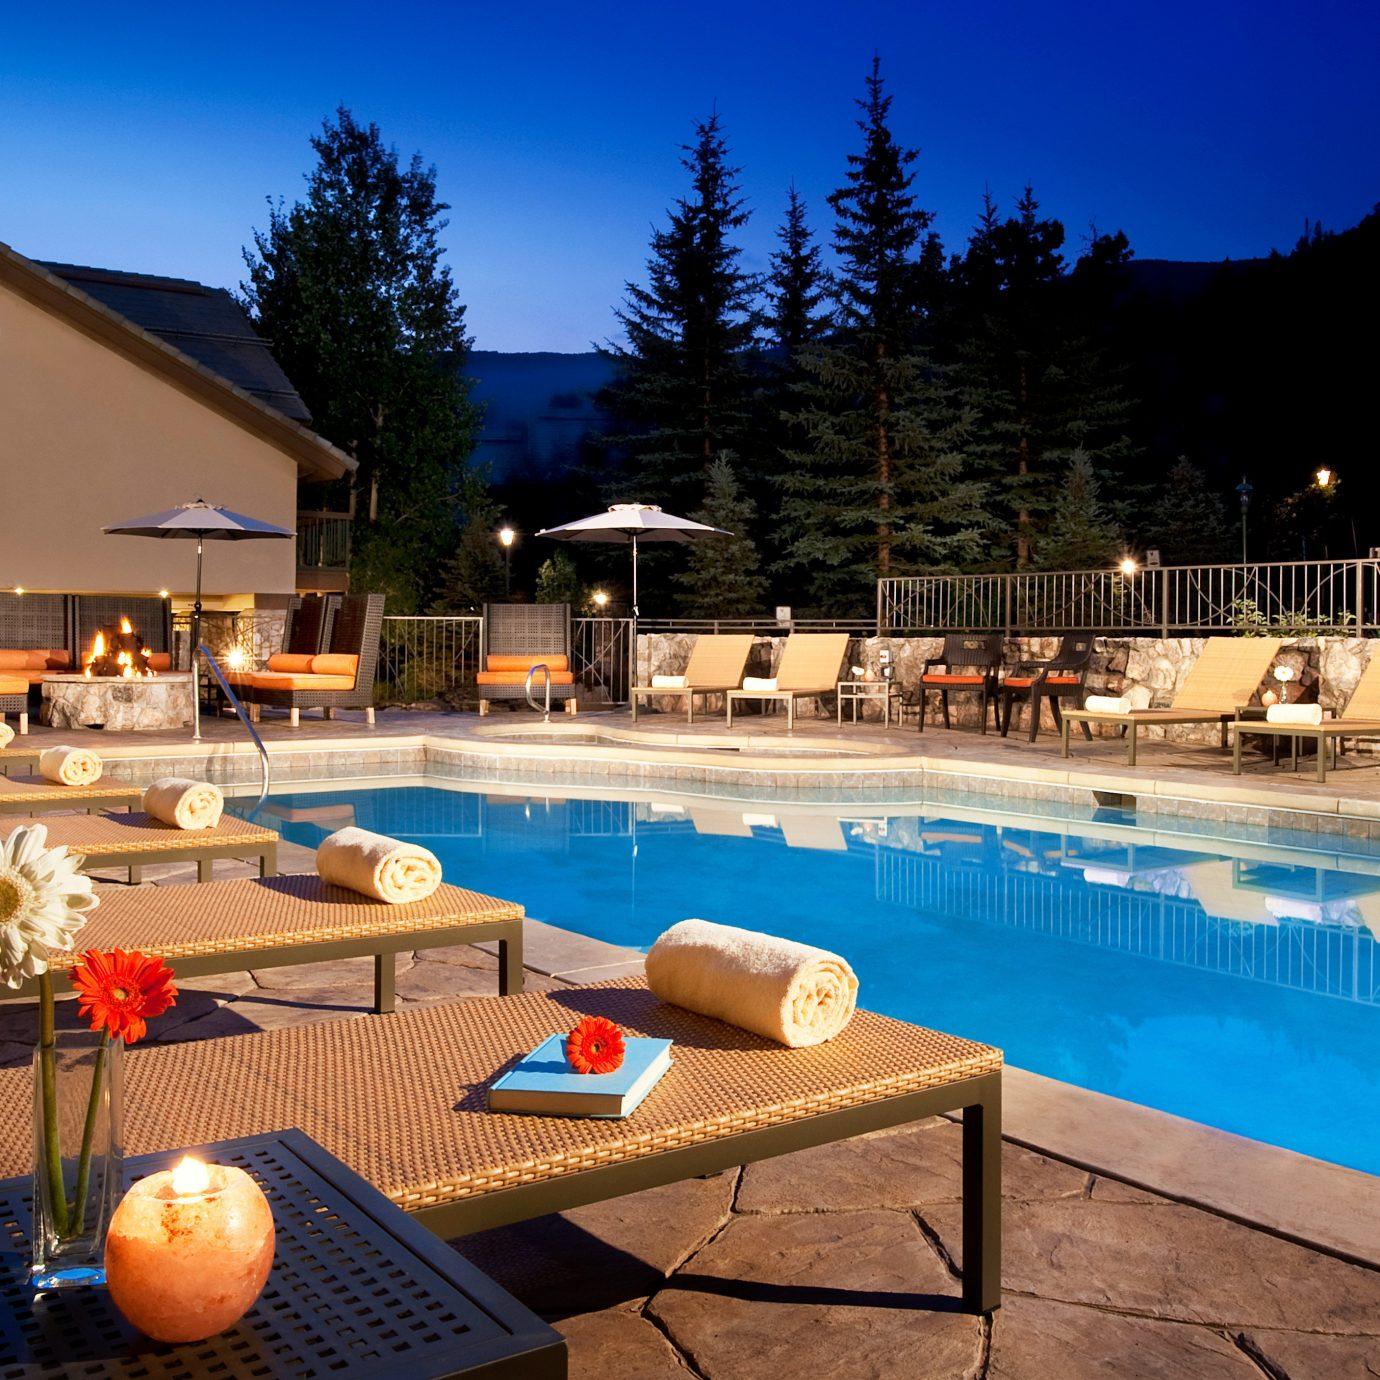 sky swimming pool leisure property Resort Pool home backyard Villa